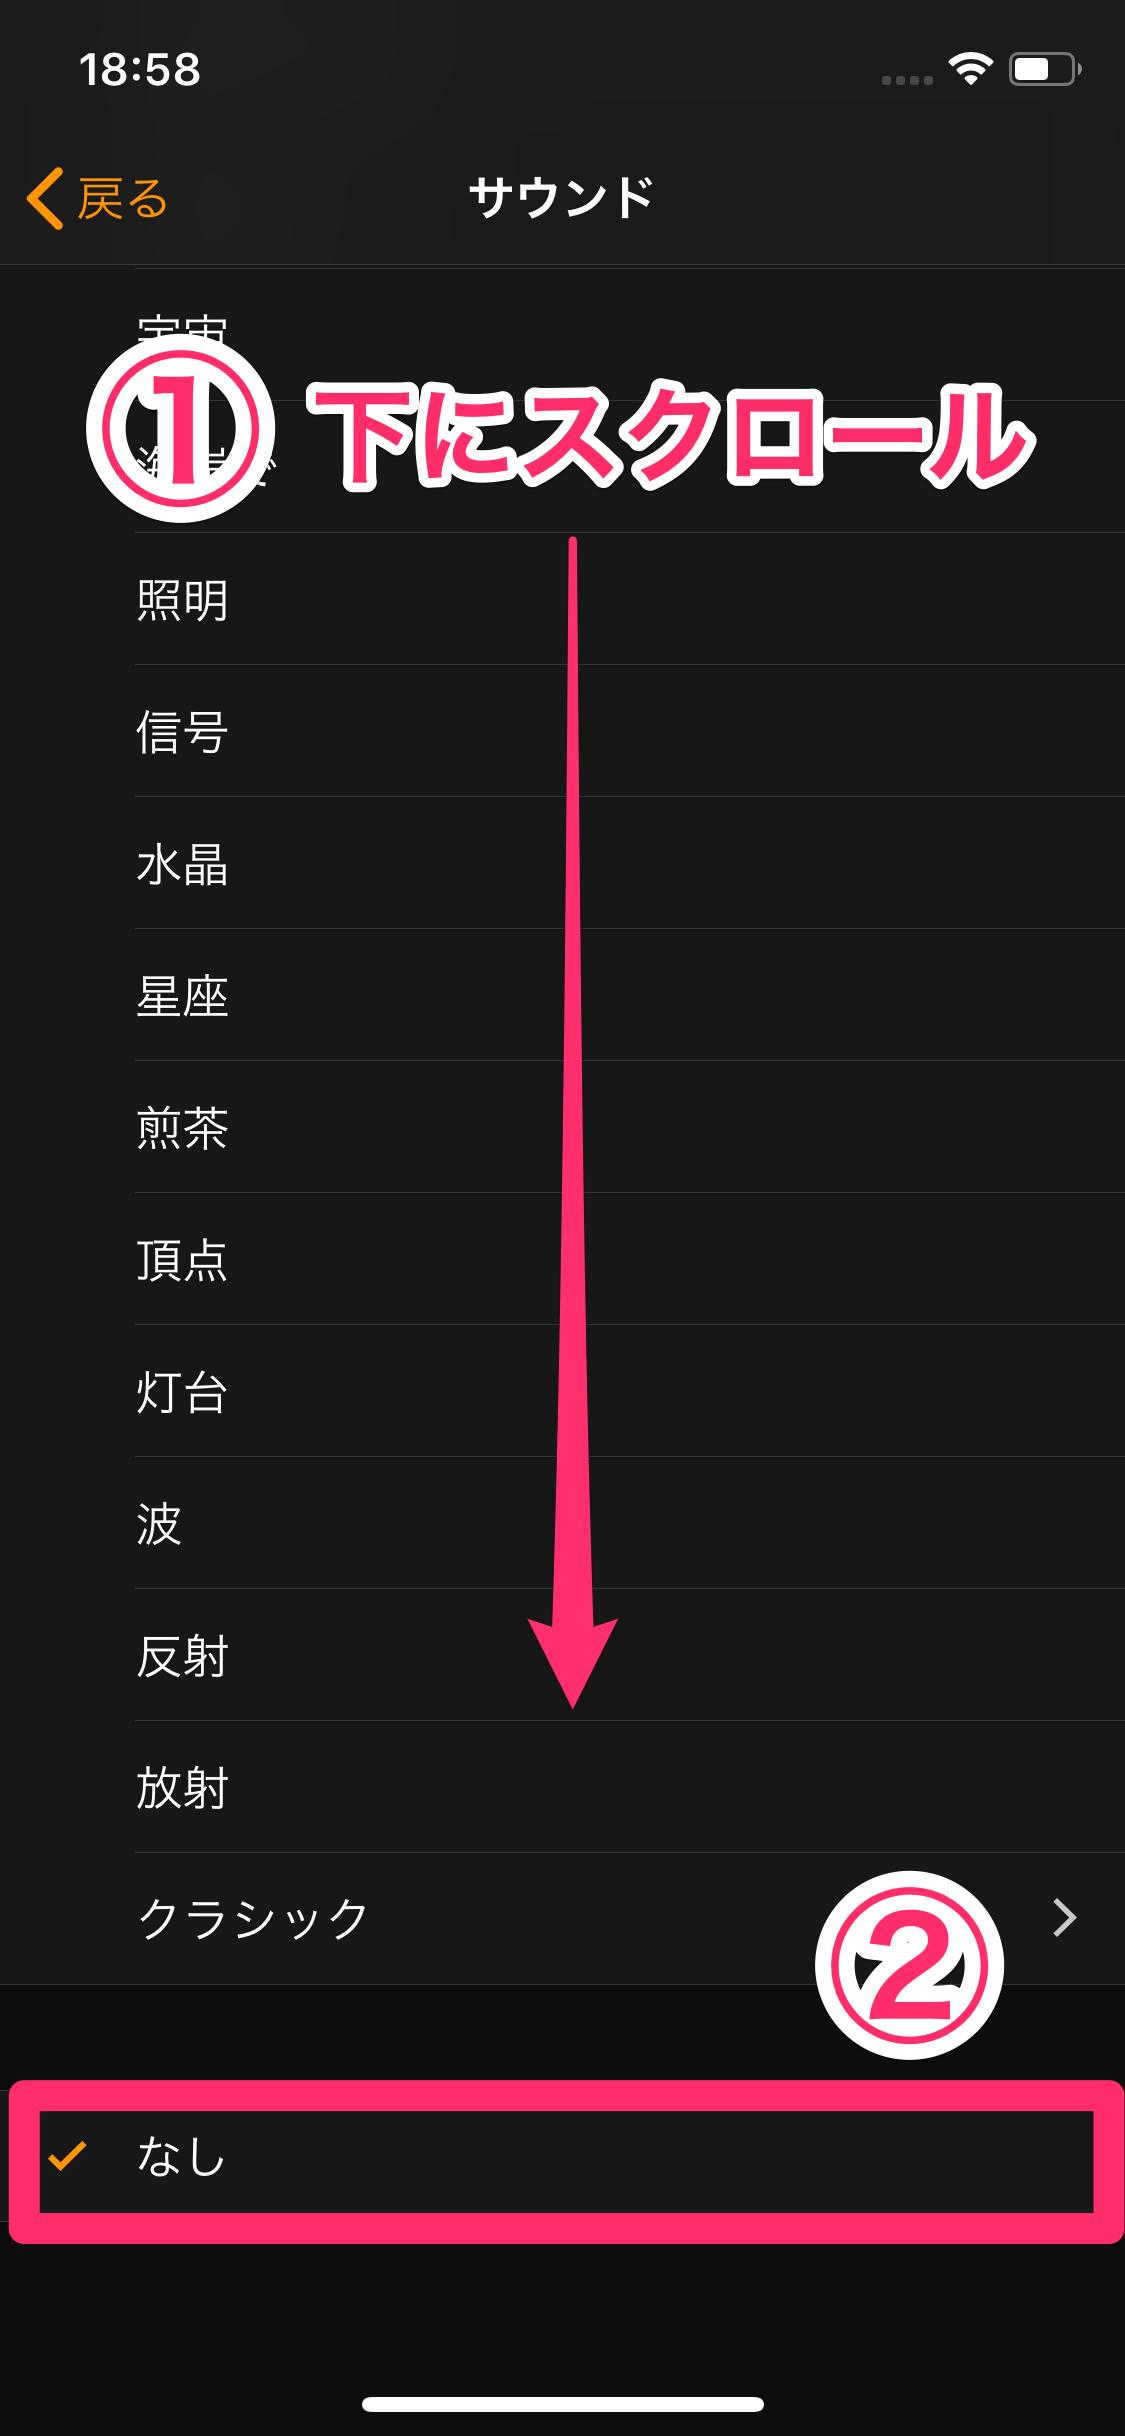 iPhoneのアラームを音なし・バイブのみにする方法。マナーモードでも鳴ってしまう音はコレで消せる!